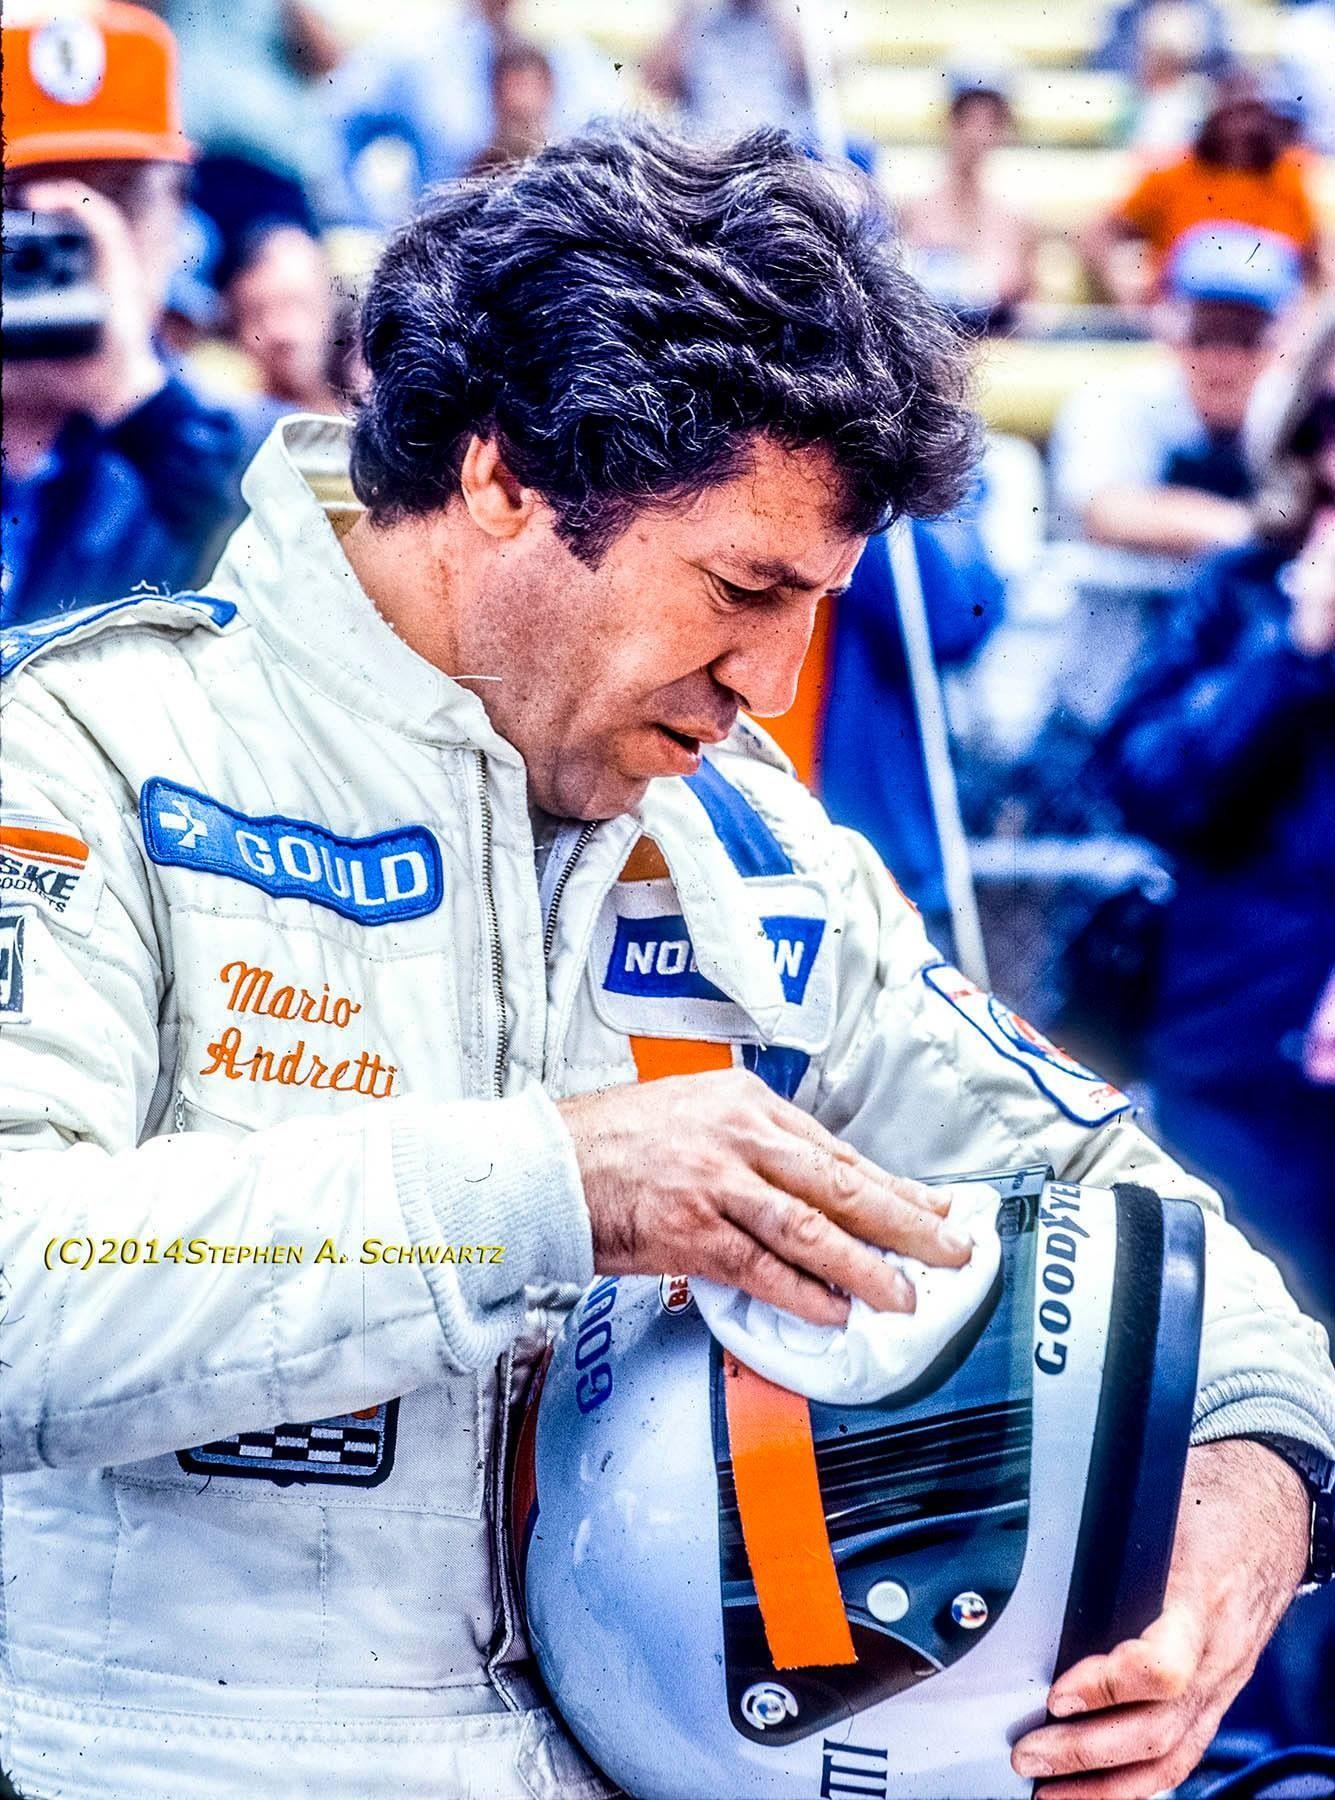 Mario Andretti, Indy. Mario andretti, Racing helmets, Mario